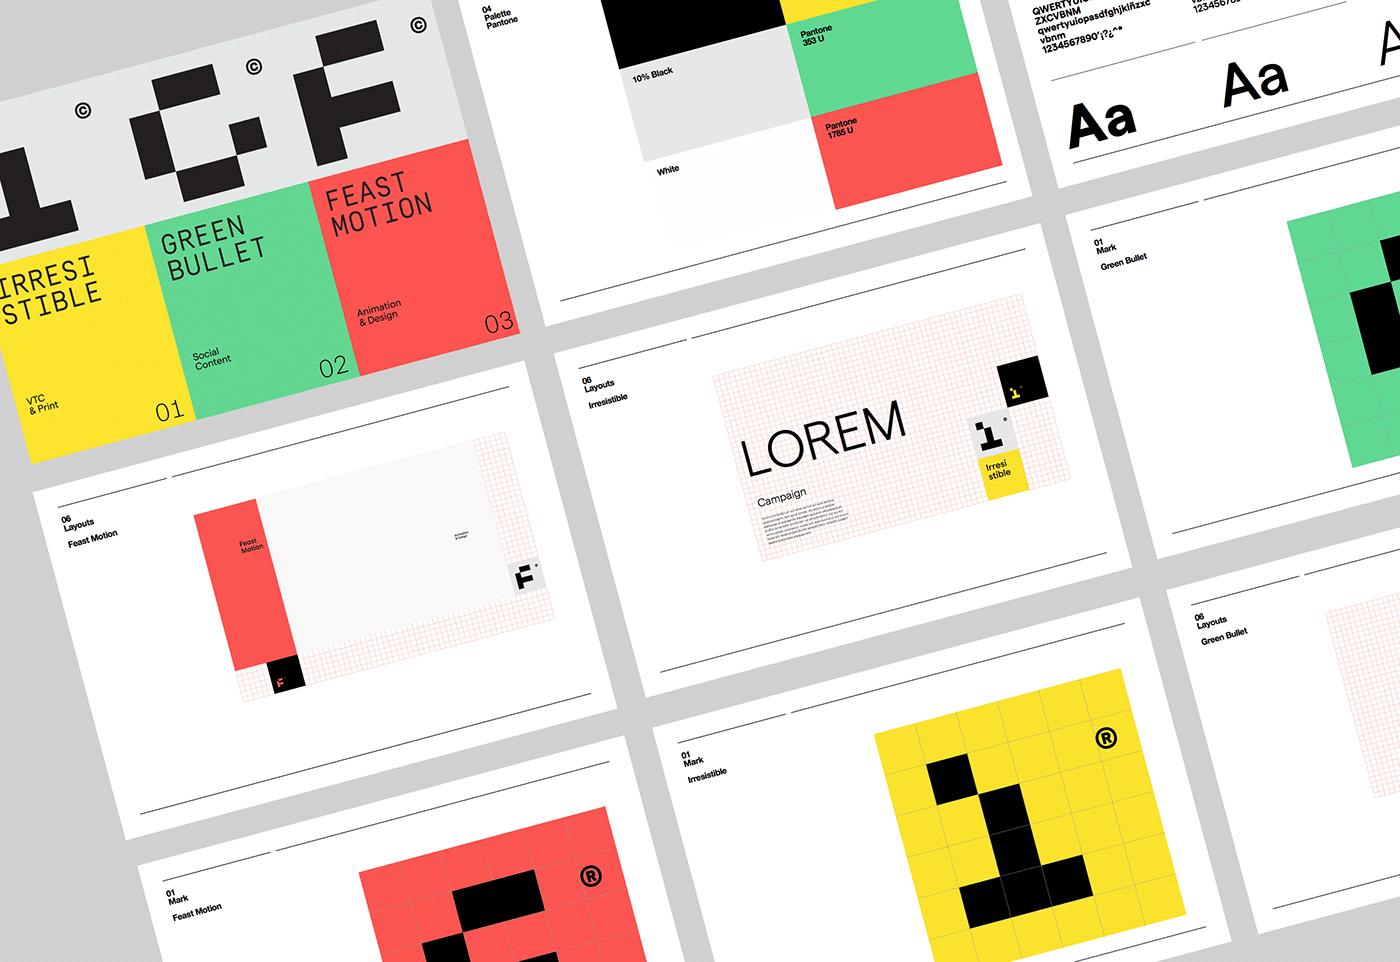 barcelona,branding ,color,digital,identity,Logotype,madrid,quimmarin,systems,trends